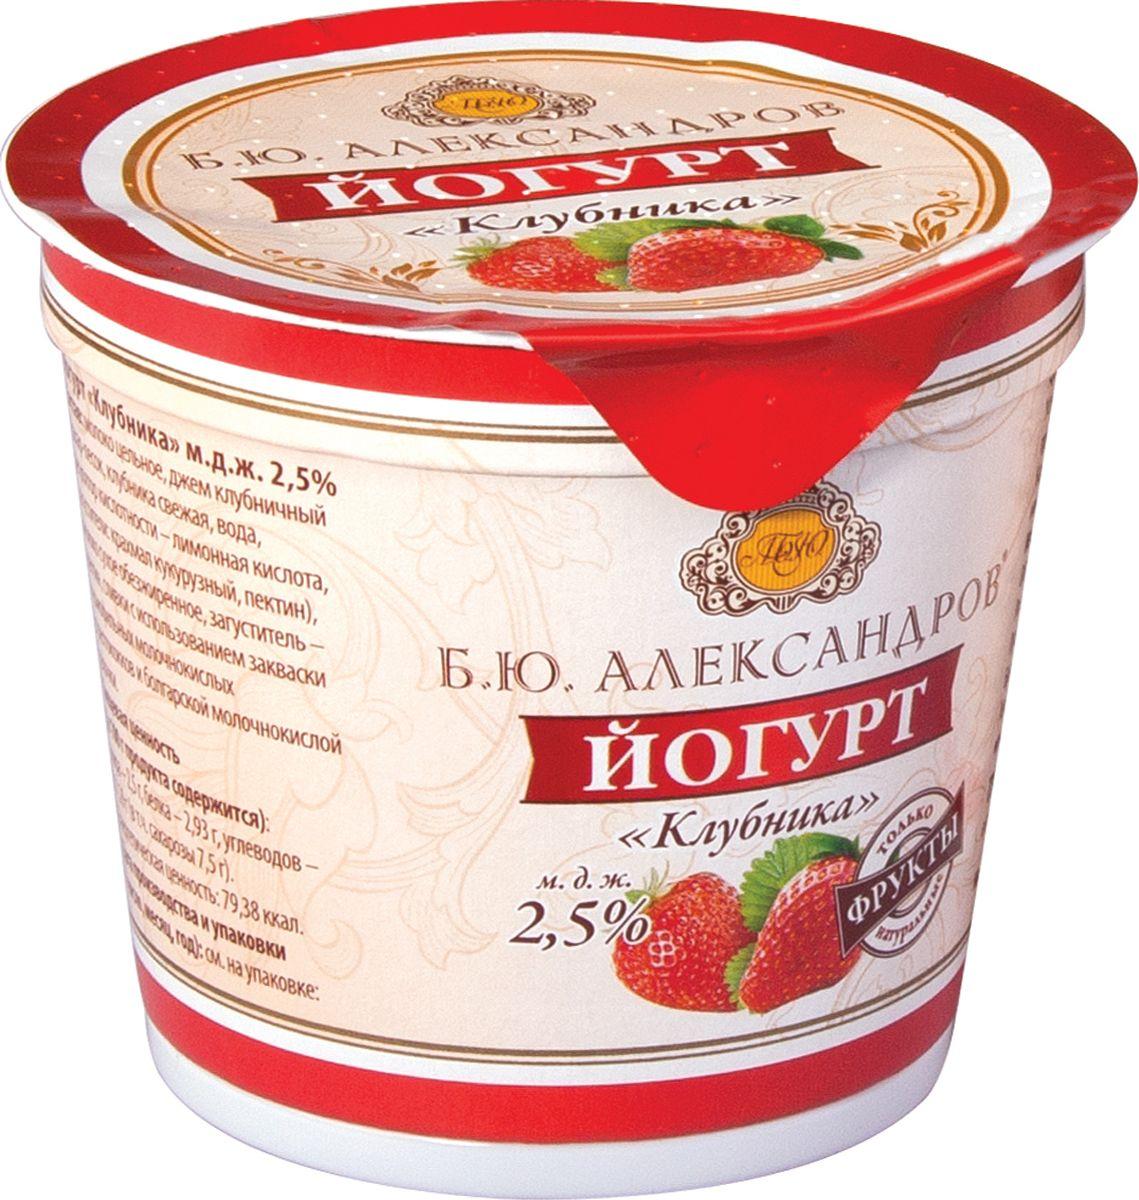 Б.Ю.Александров Йогурт Клубника 2,5%, 125 г ritter sport пралине шоколад молочный с пралиновой начинкой 100 г